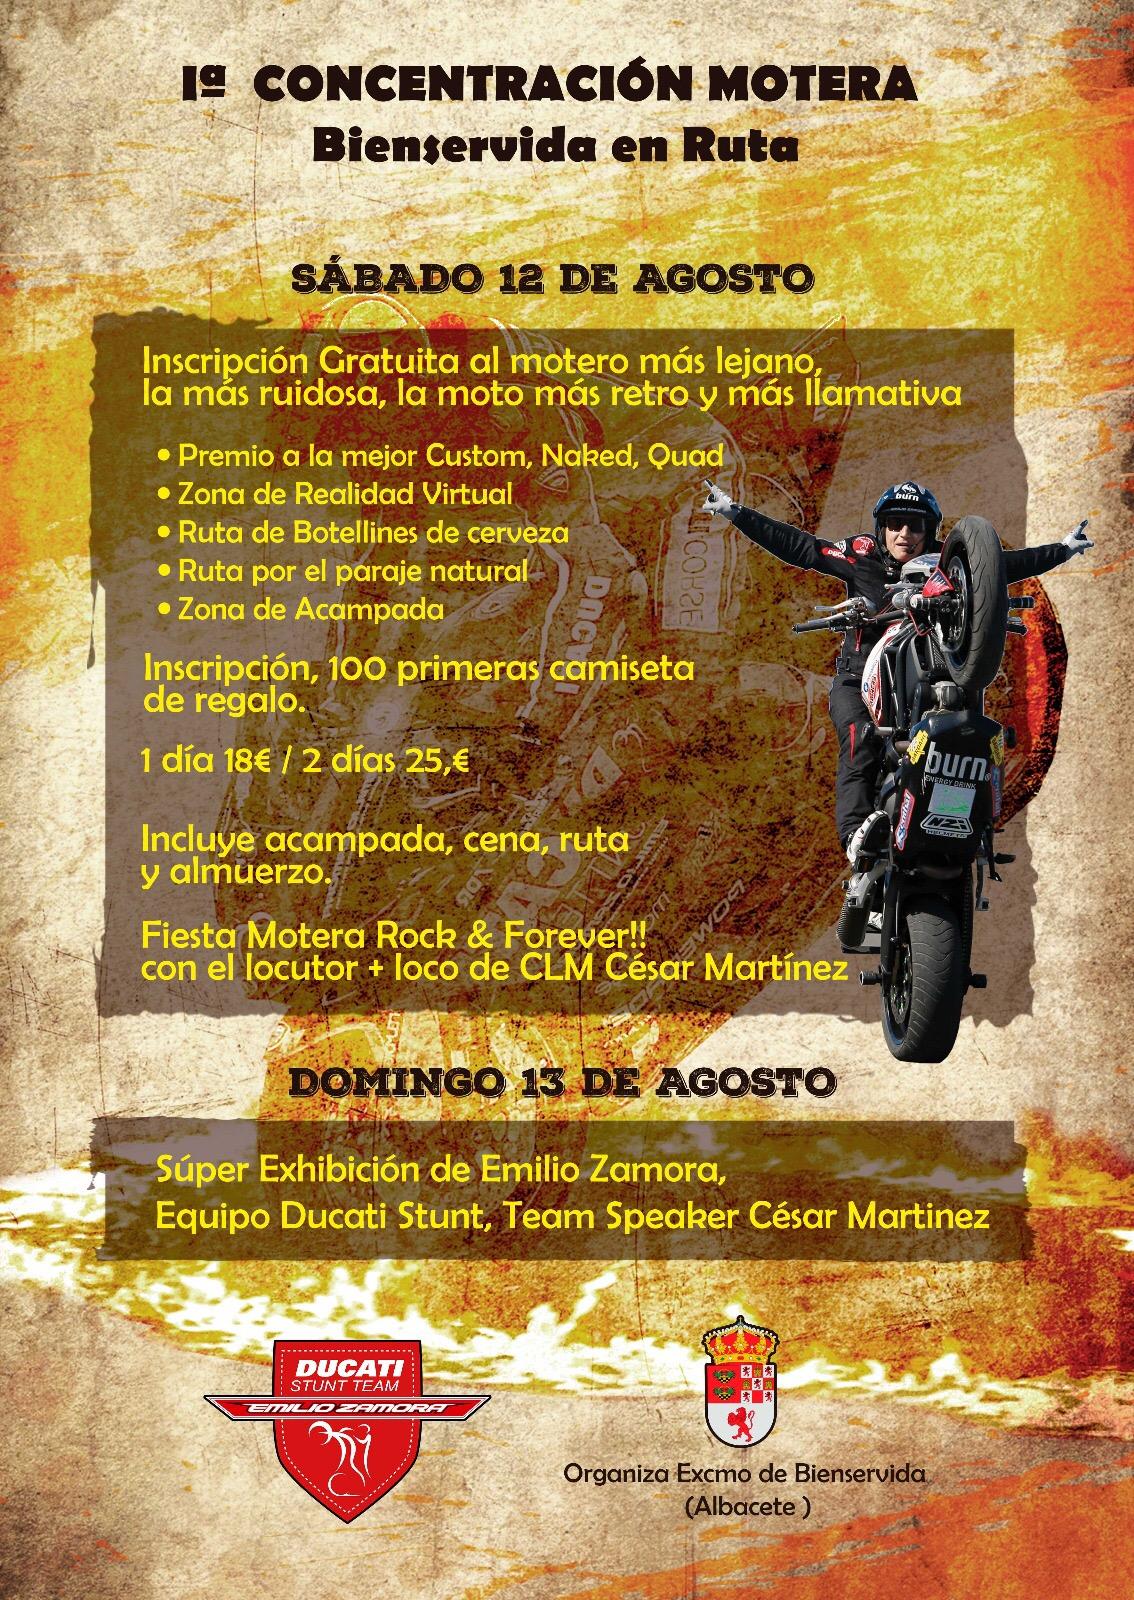 CONCENTRACION MOTERA BIENSERVIDA ALBACETE_EMILIO_ZAMORA_DUCATI_STUNT_TEAM_MOTOCICLISMO_MOTOR_SHOW_QUAD_MOTO_ESPECTACULO_MINIMOTO_LEGEND_CAR_KART_CORSS_DRIFT_CABALLITO